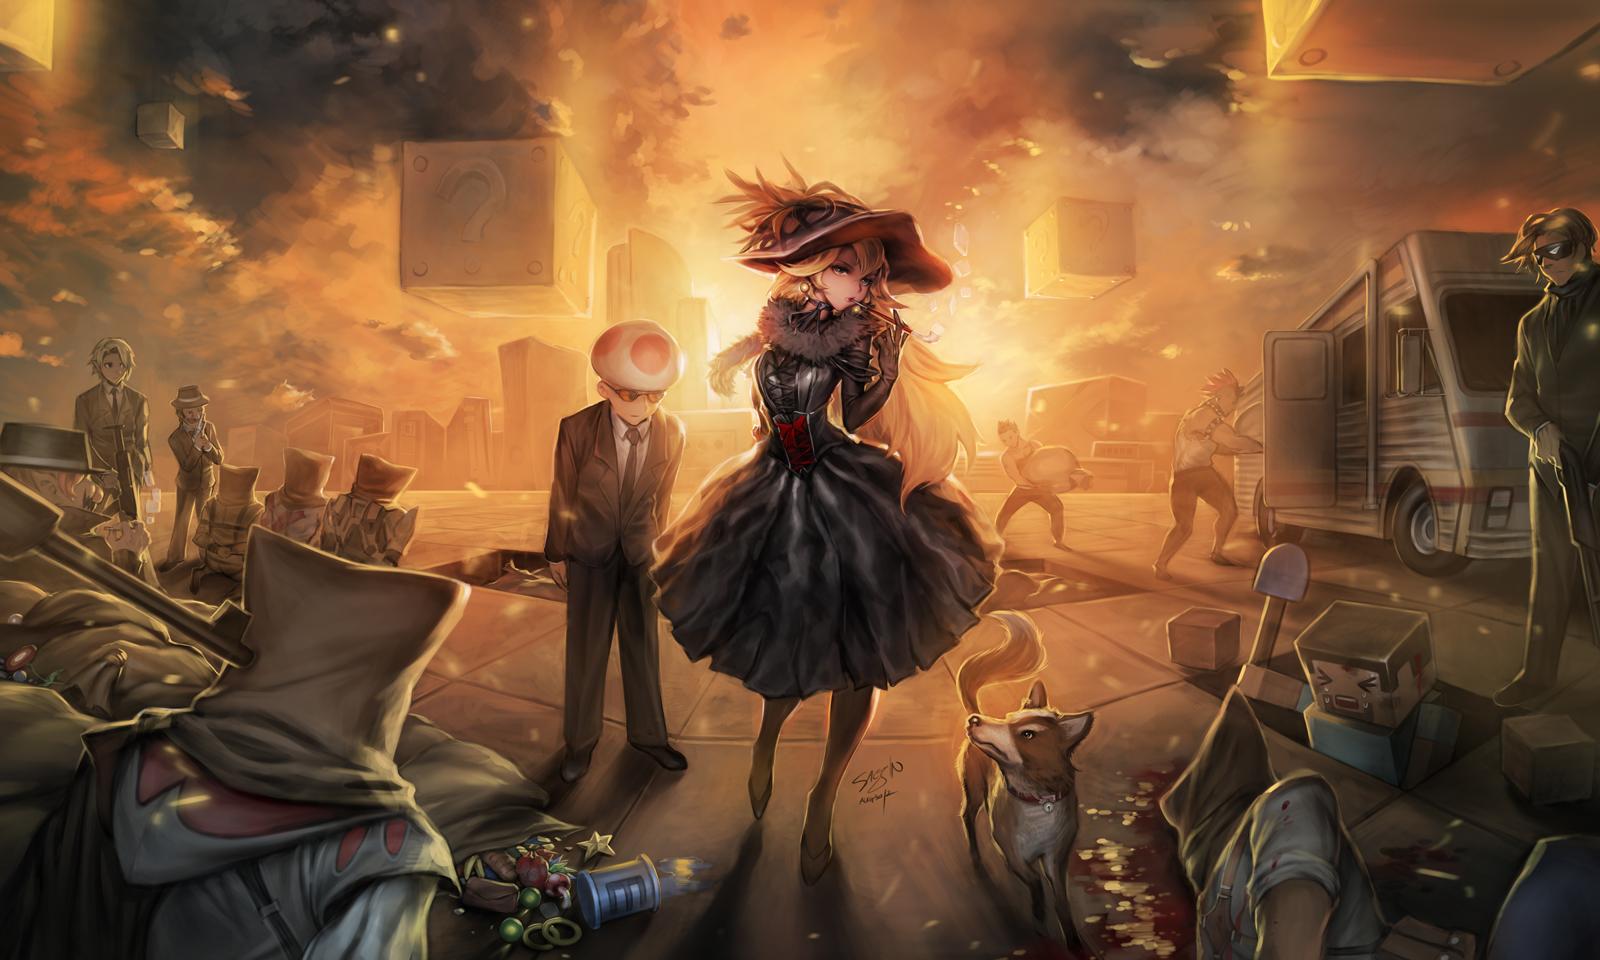 Evil princess 3d nsfw images